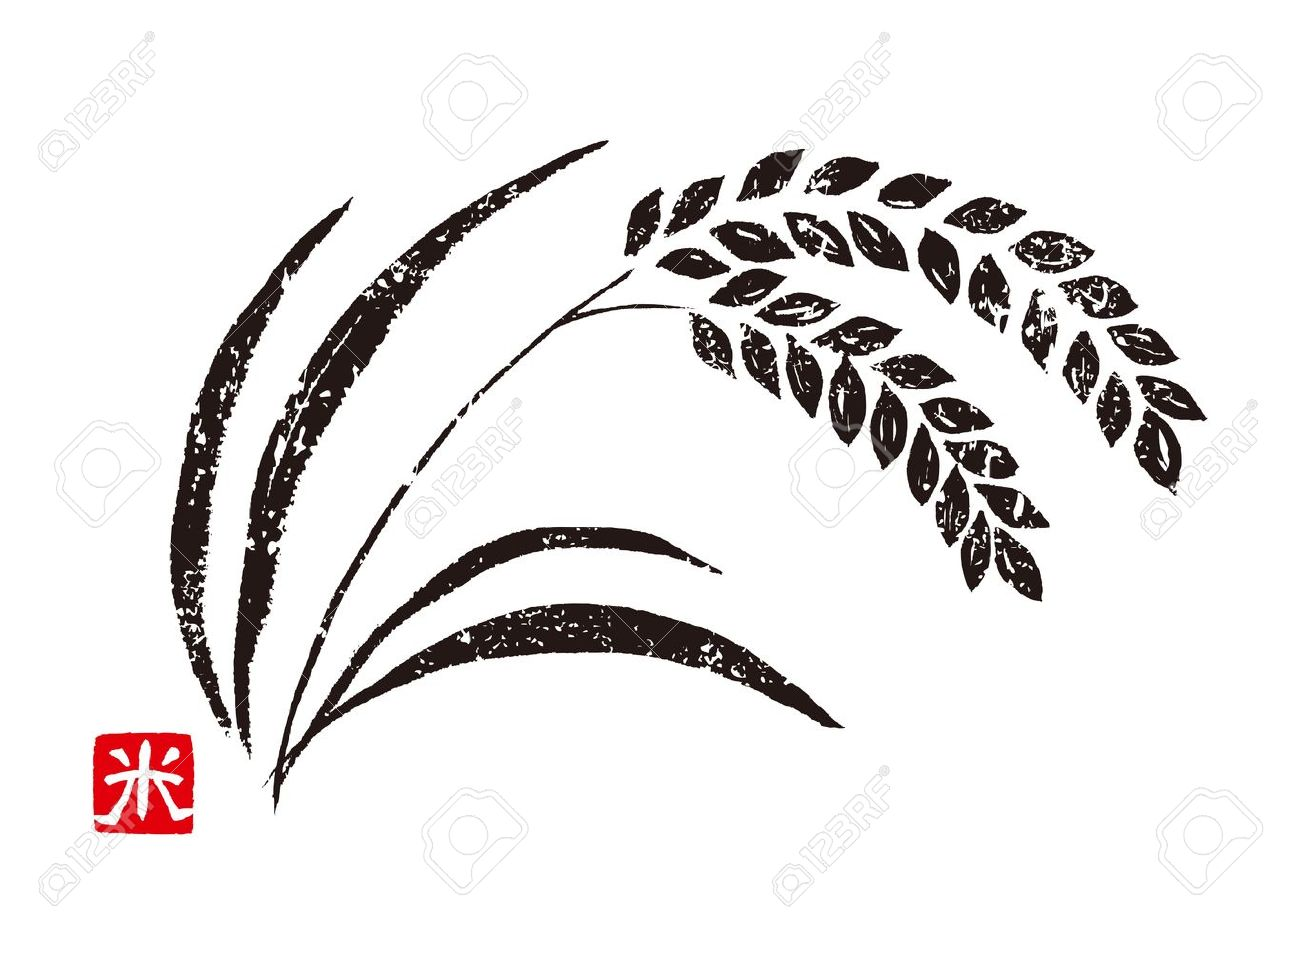 1300x975 Drawn Grain Vector